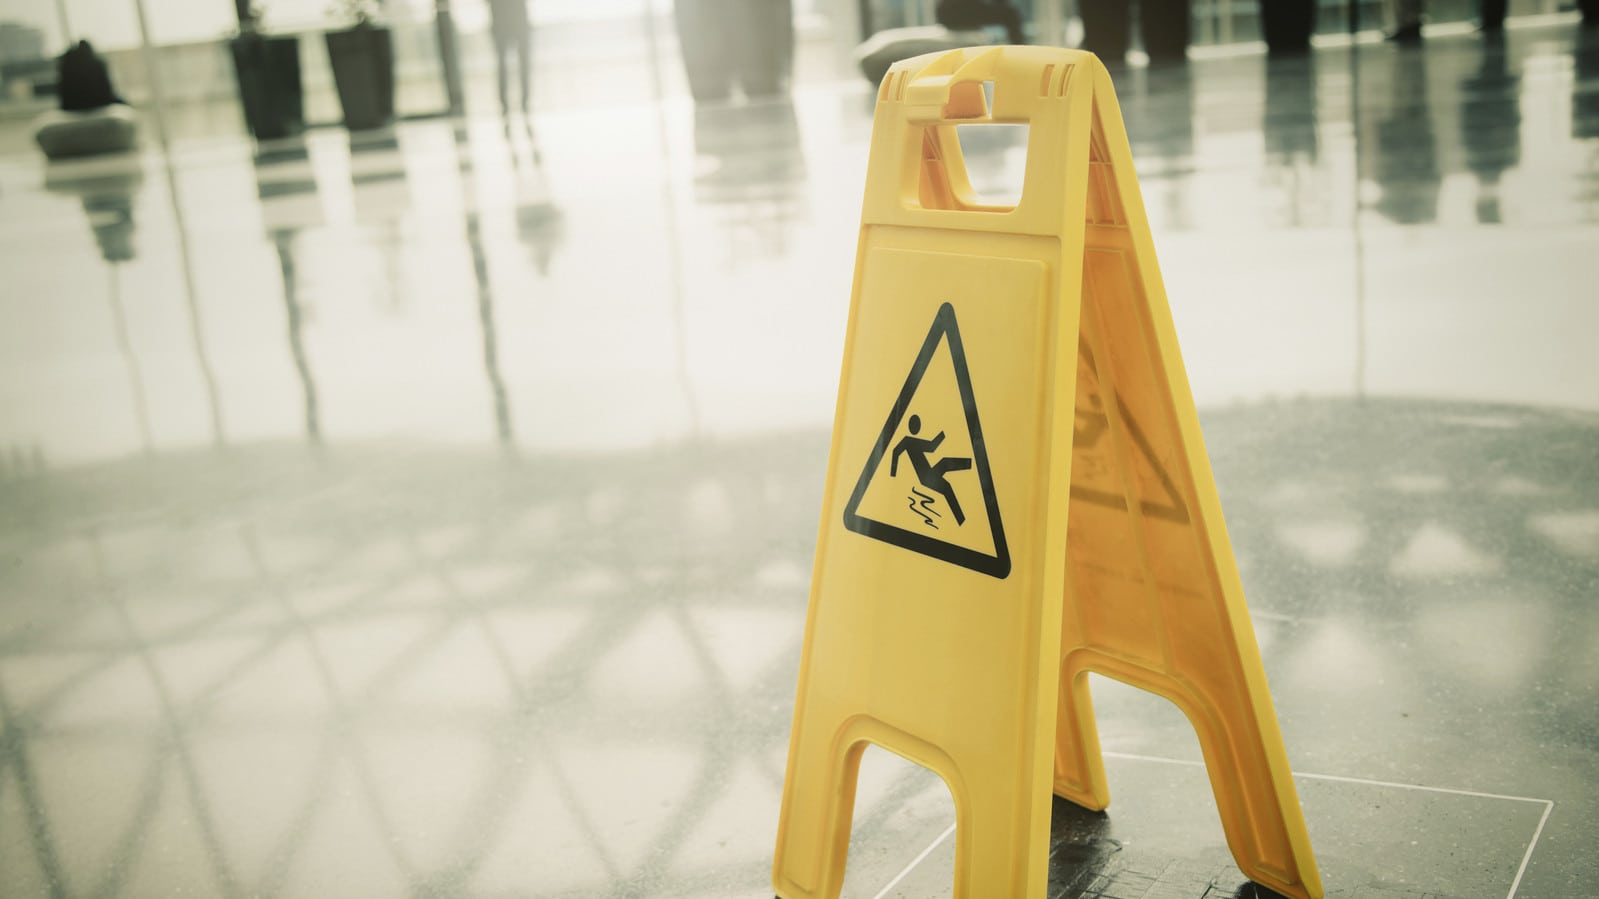 Caution Slippery Stock Photo